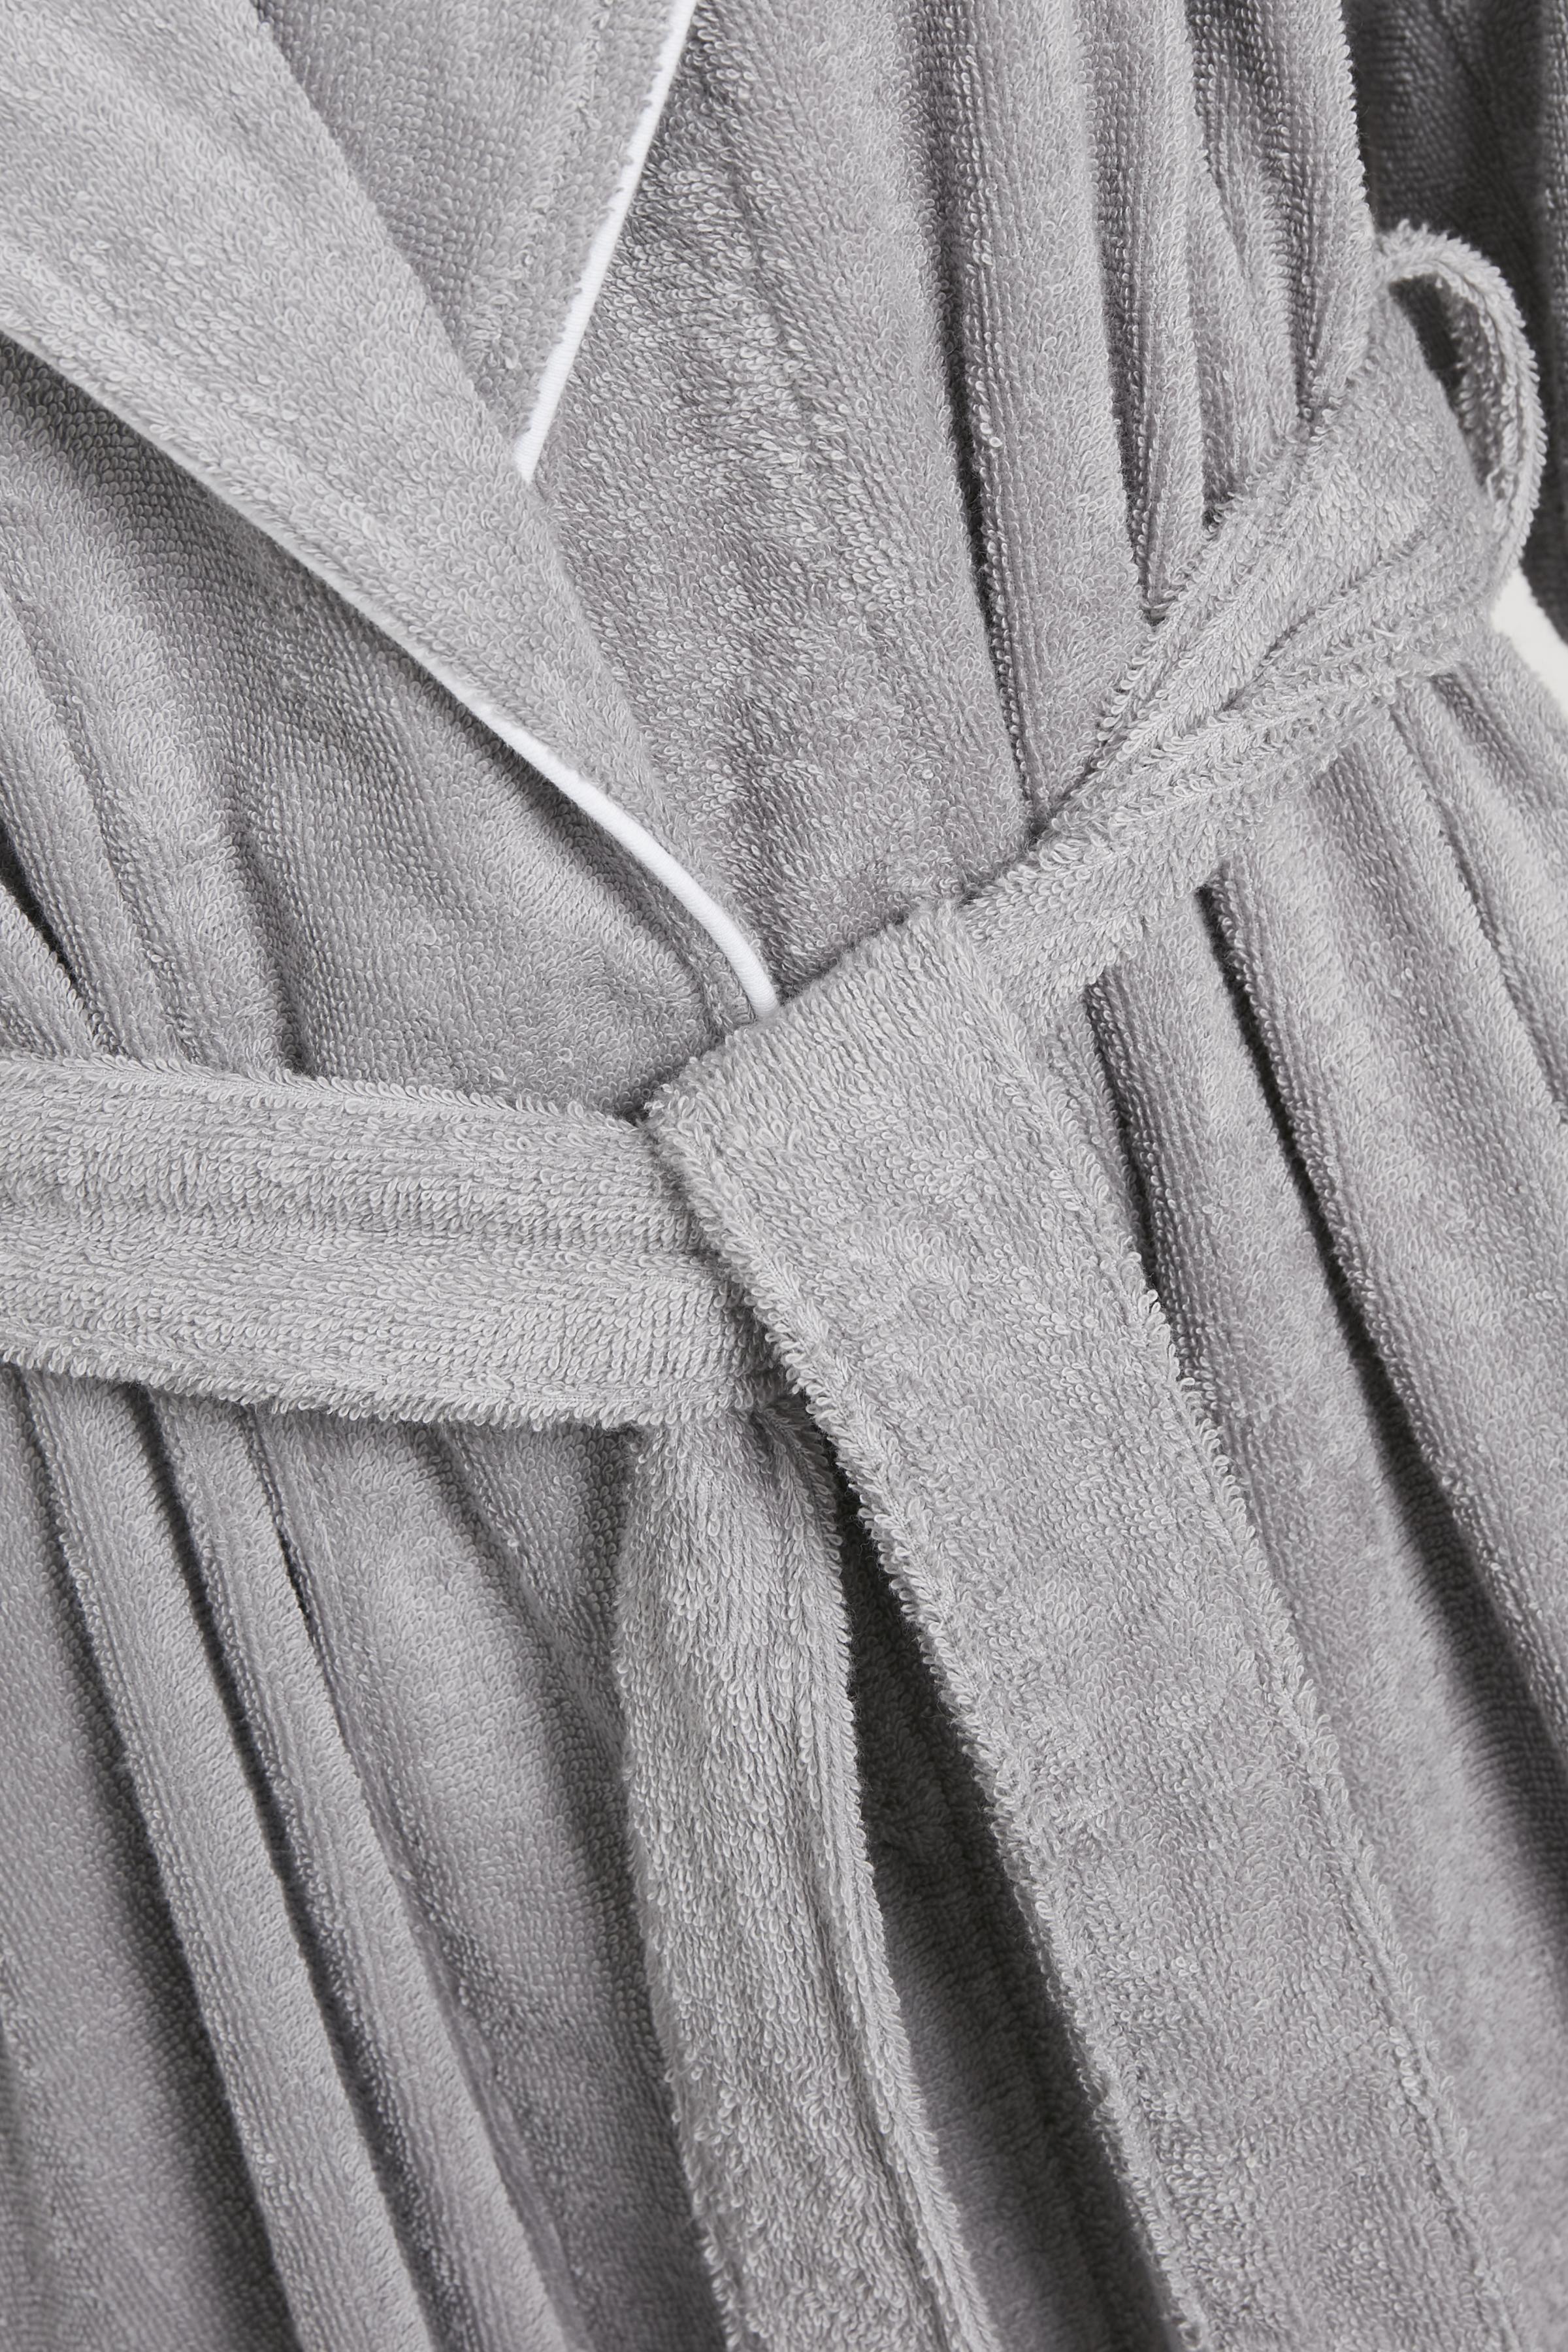 Sølvgrå Morgenkåbe fra Triumph – Køb Sølvgrå Morgenkåbe fra str. 36-44 her